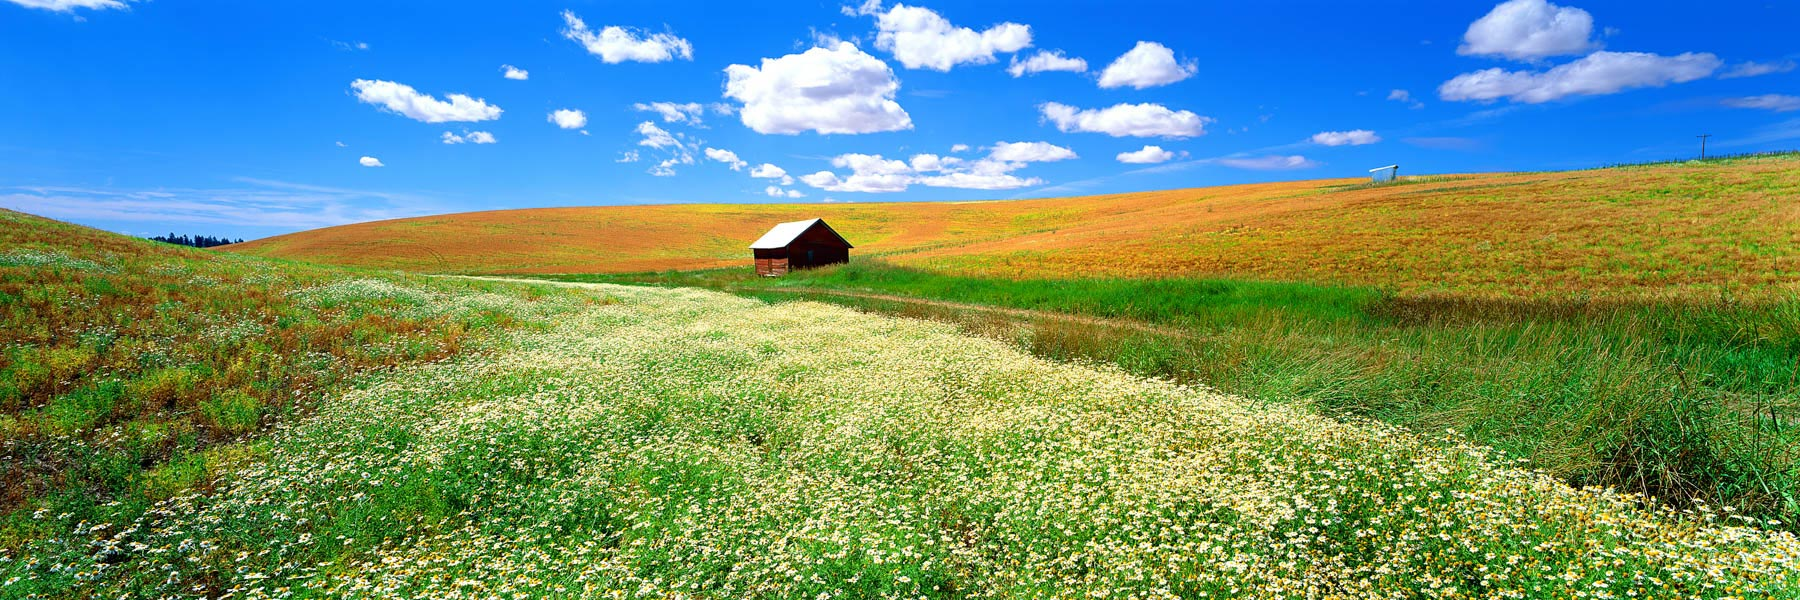 A field of wildflowers on a hillside, Idaho, USA,